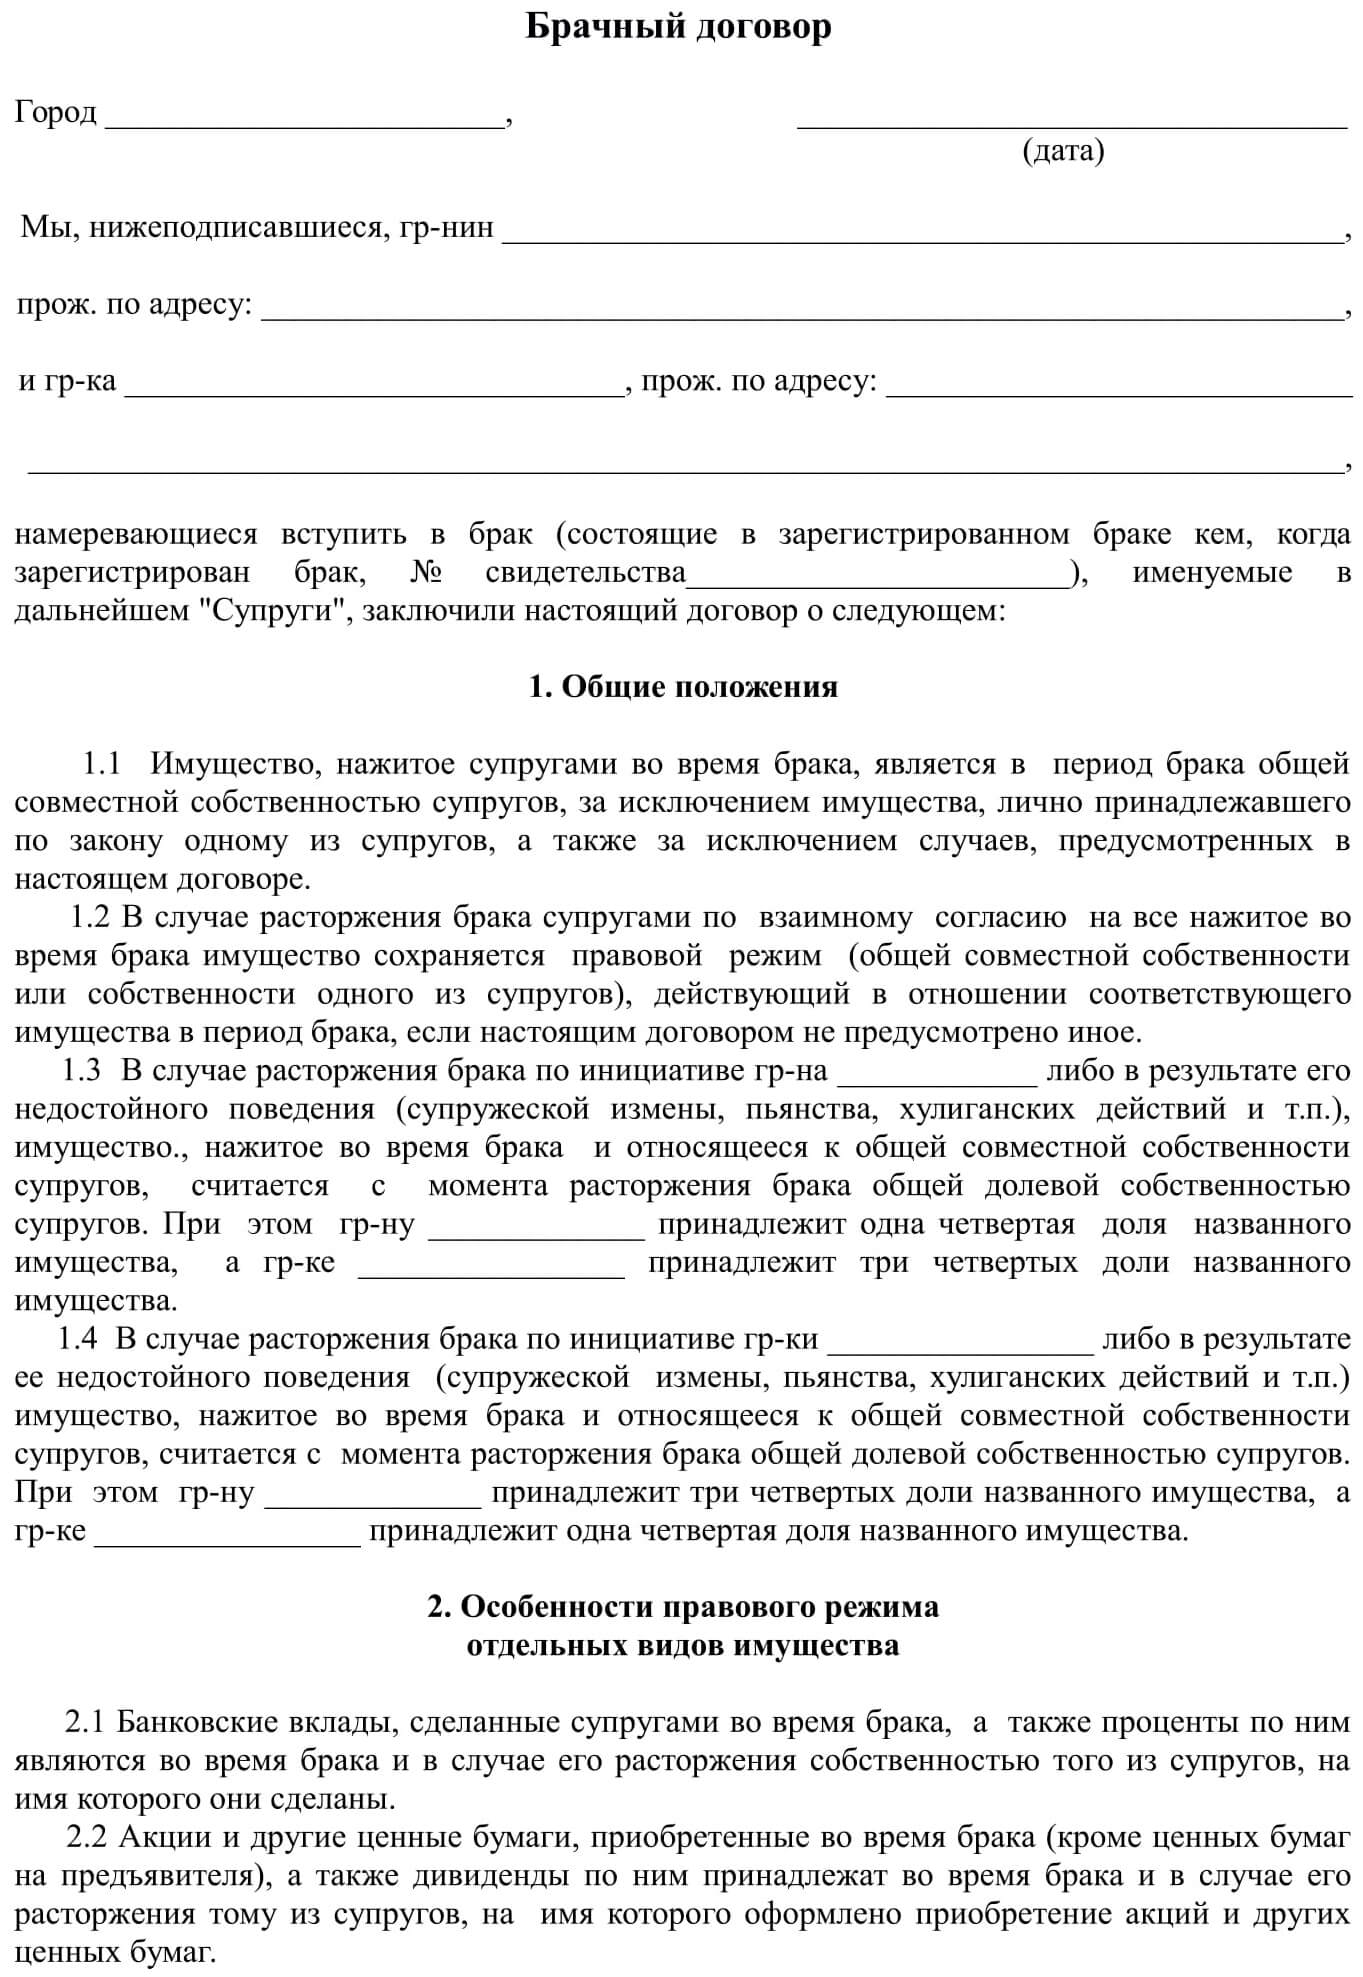 Образец брачного договора (контракта)